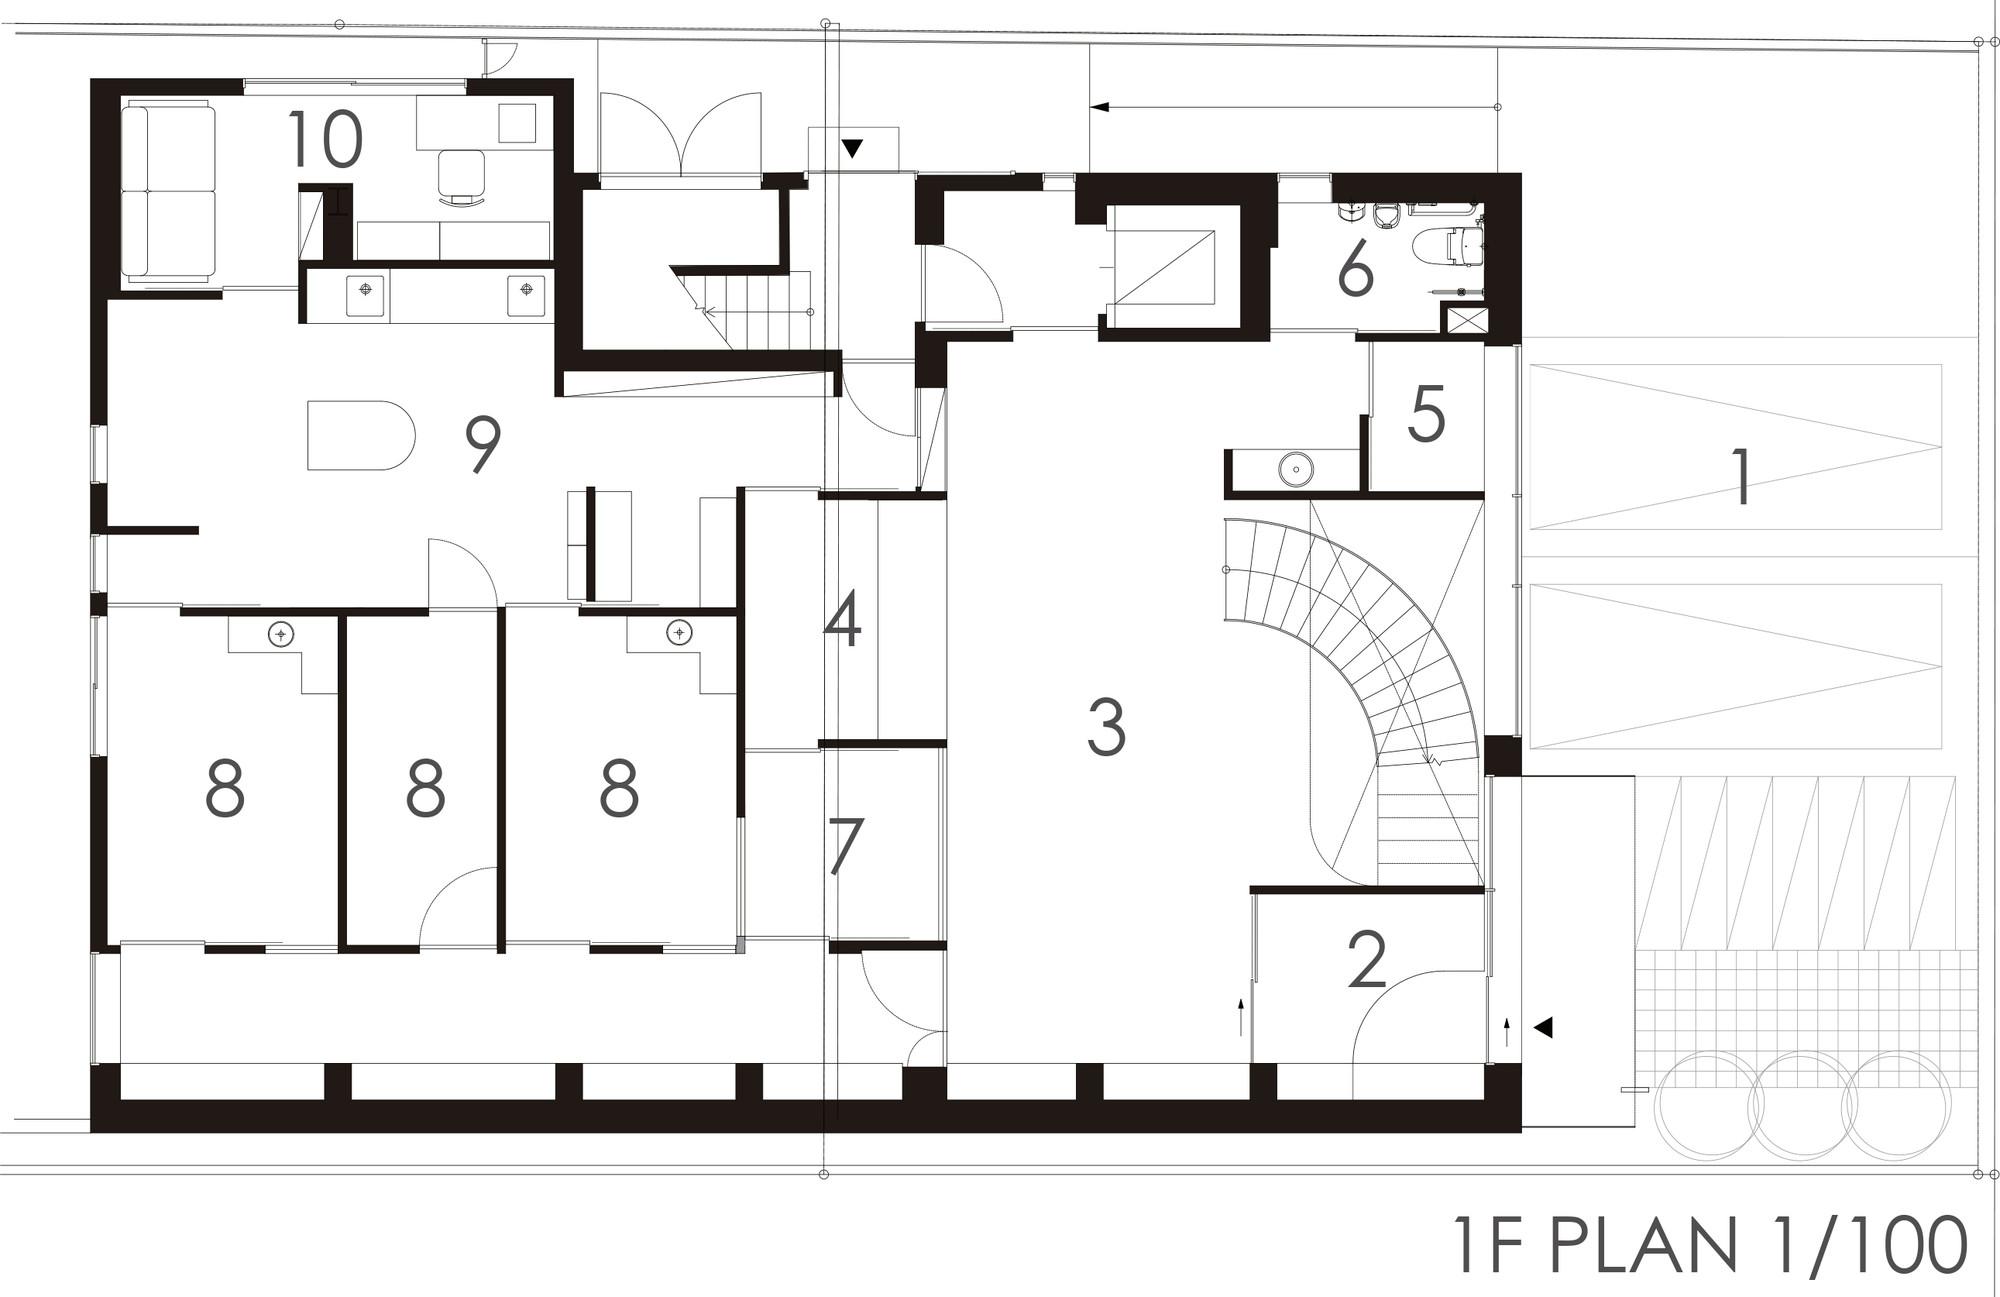 dental office design pediatric floor plans pediatric. First Floor Plan Dental Office Design Pediatric Plans B